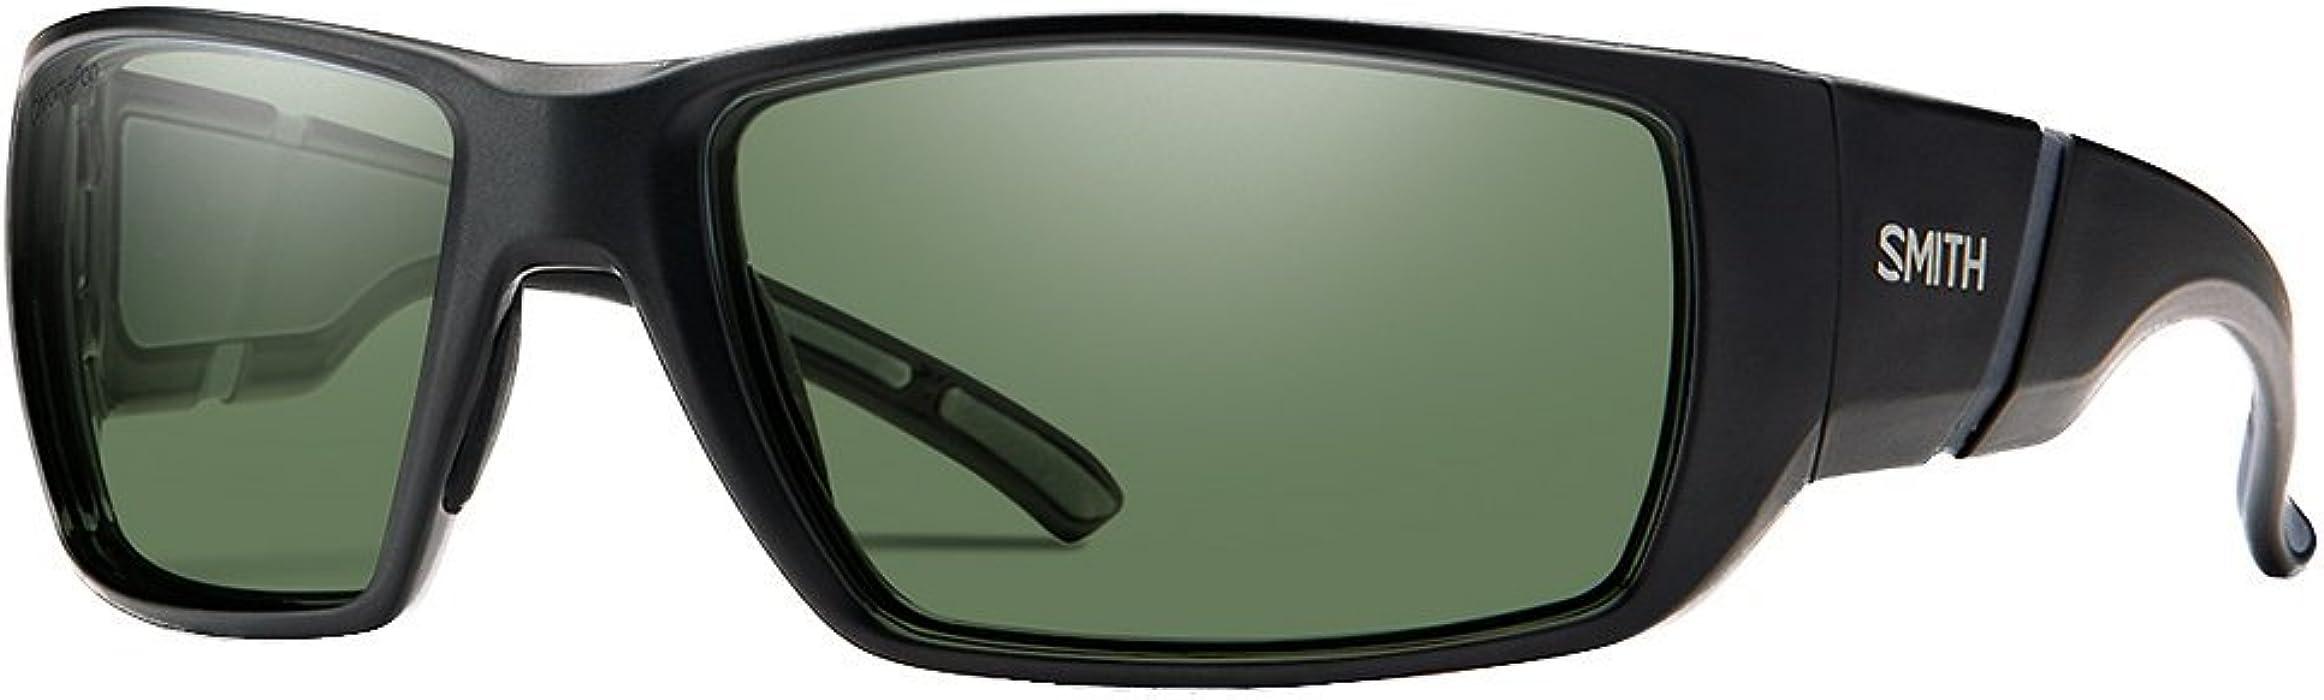 733864efcfc Smith Optics Mens Active Transfer Chromapop Sunglasses - Matte ...